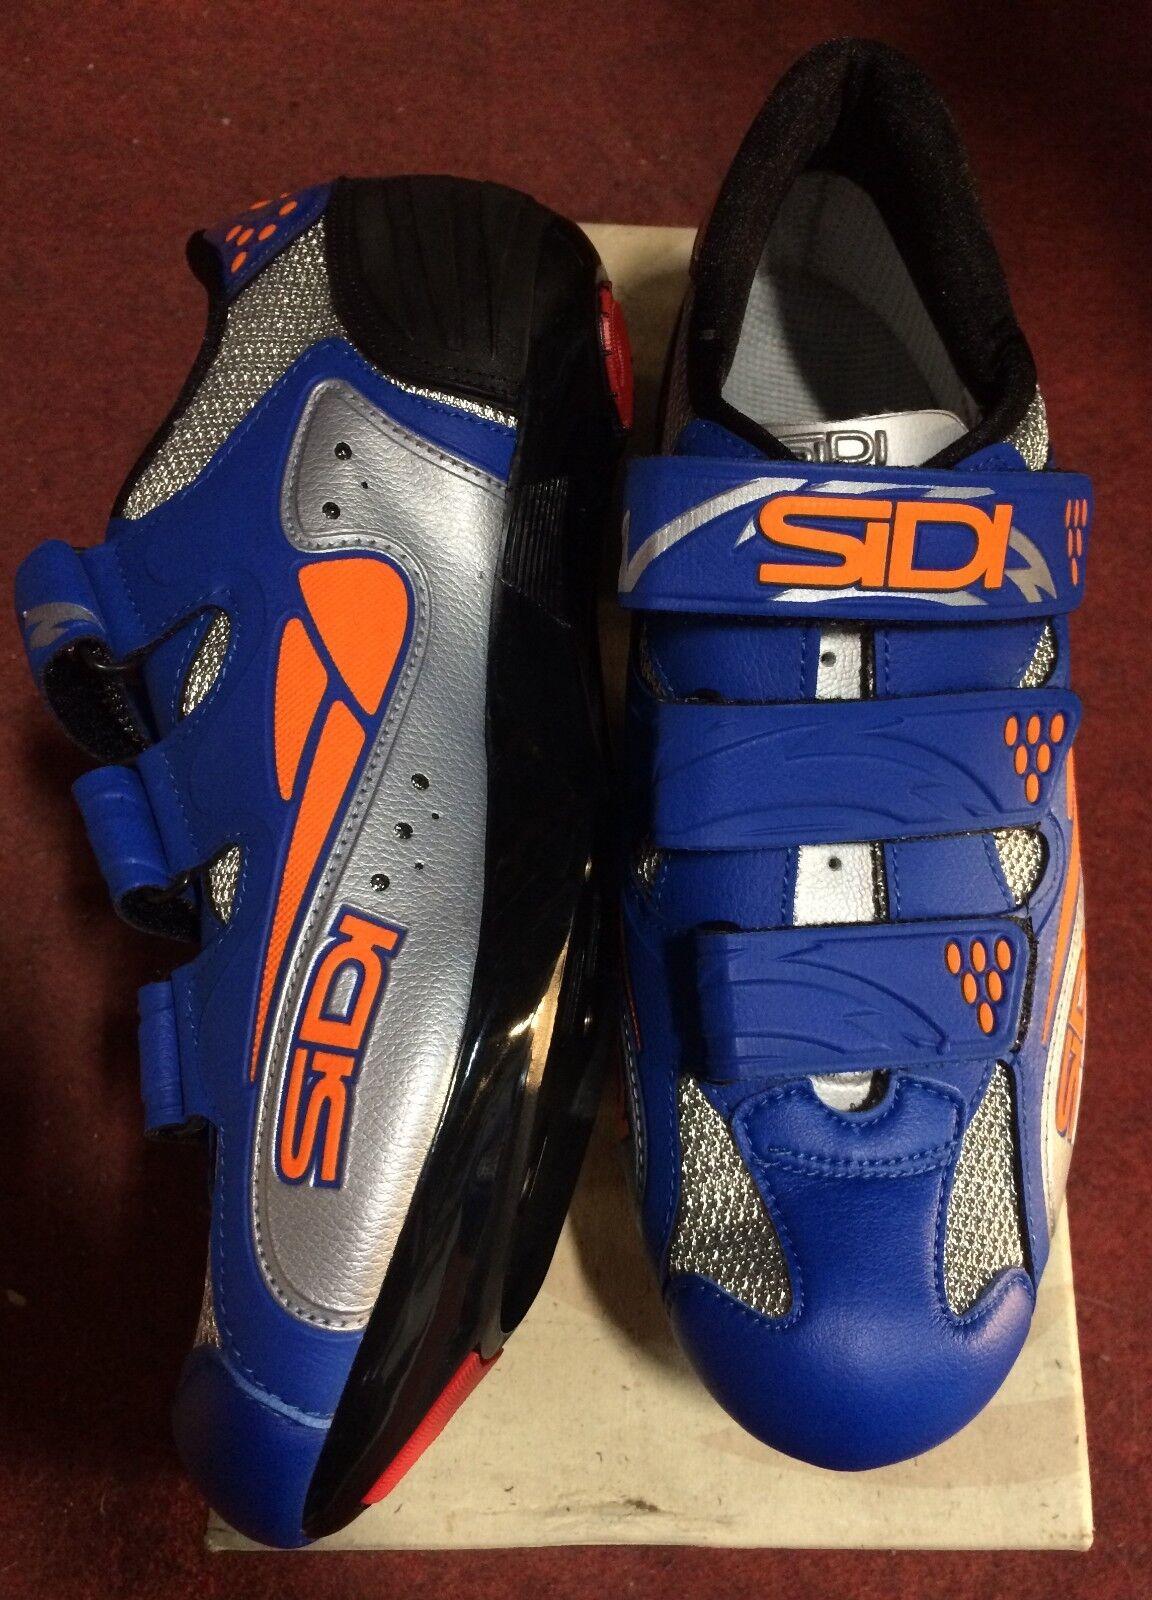 shoes bici corsa Sidi Iron strada road bike shoes 41 blue arancio